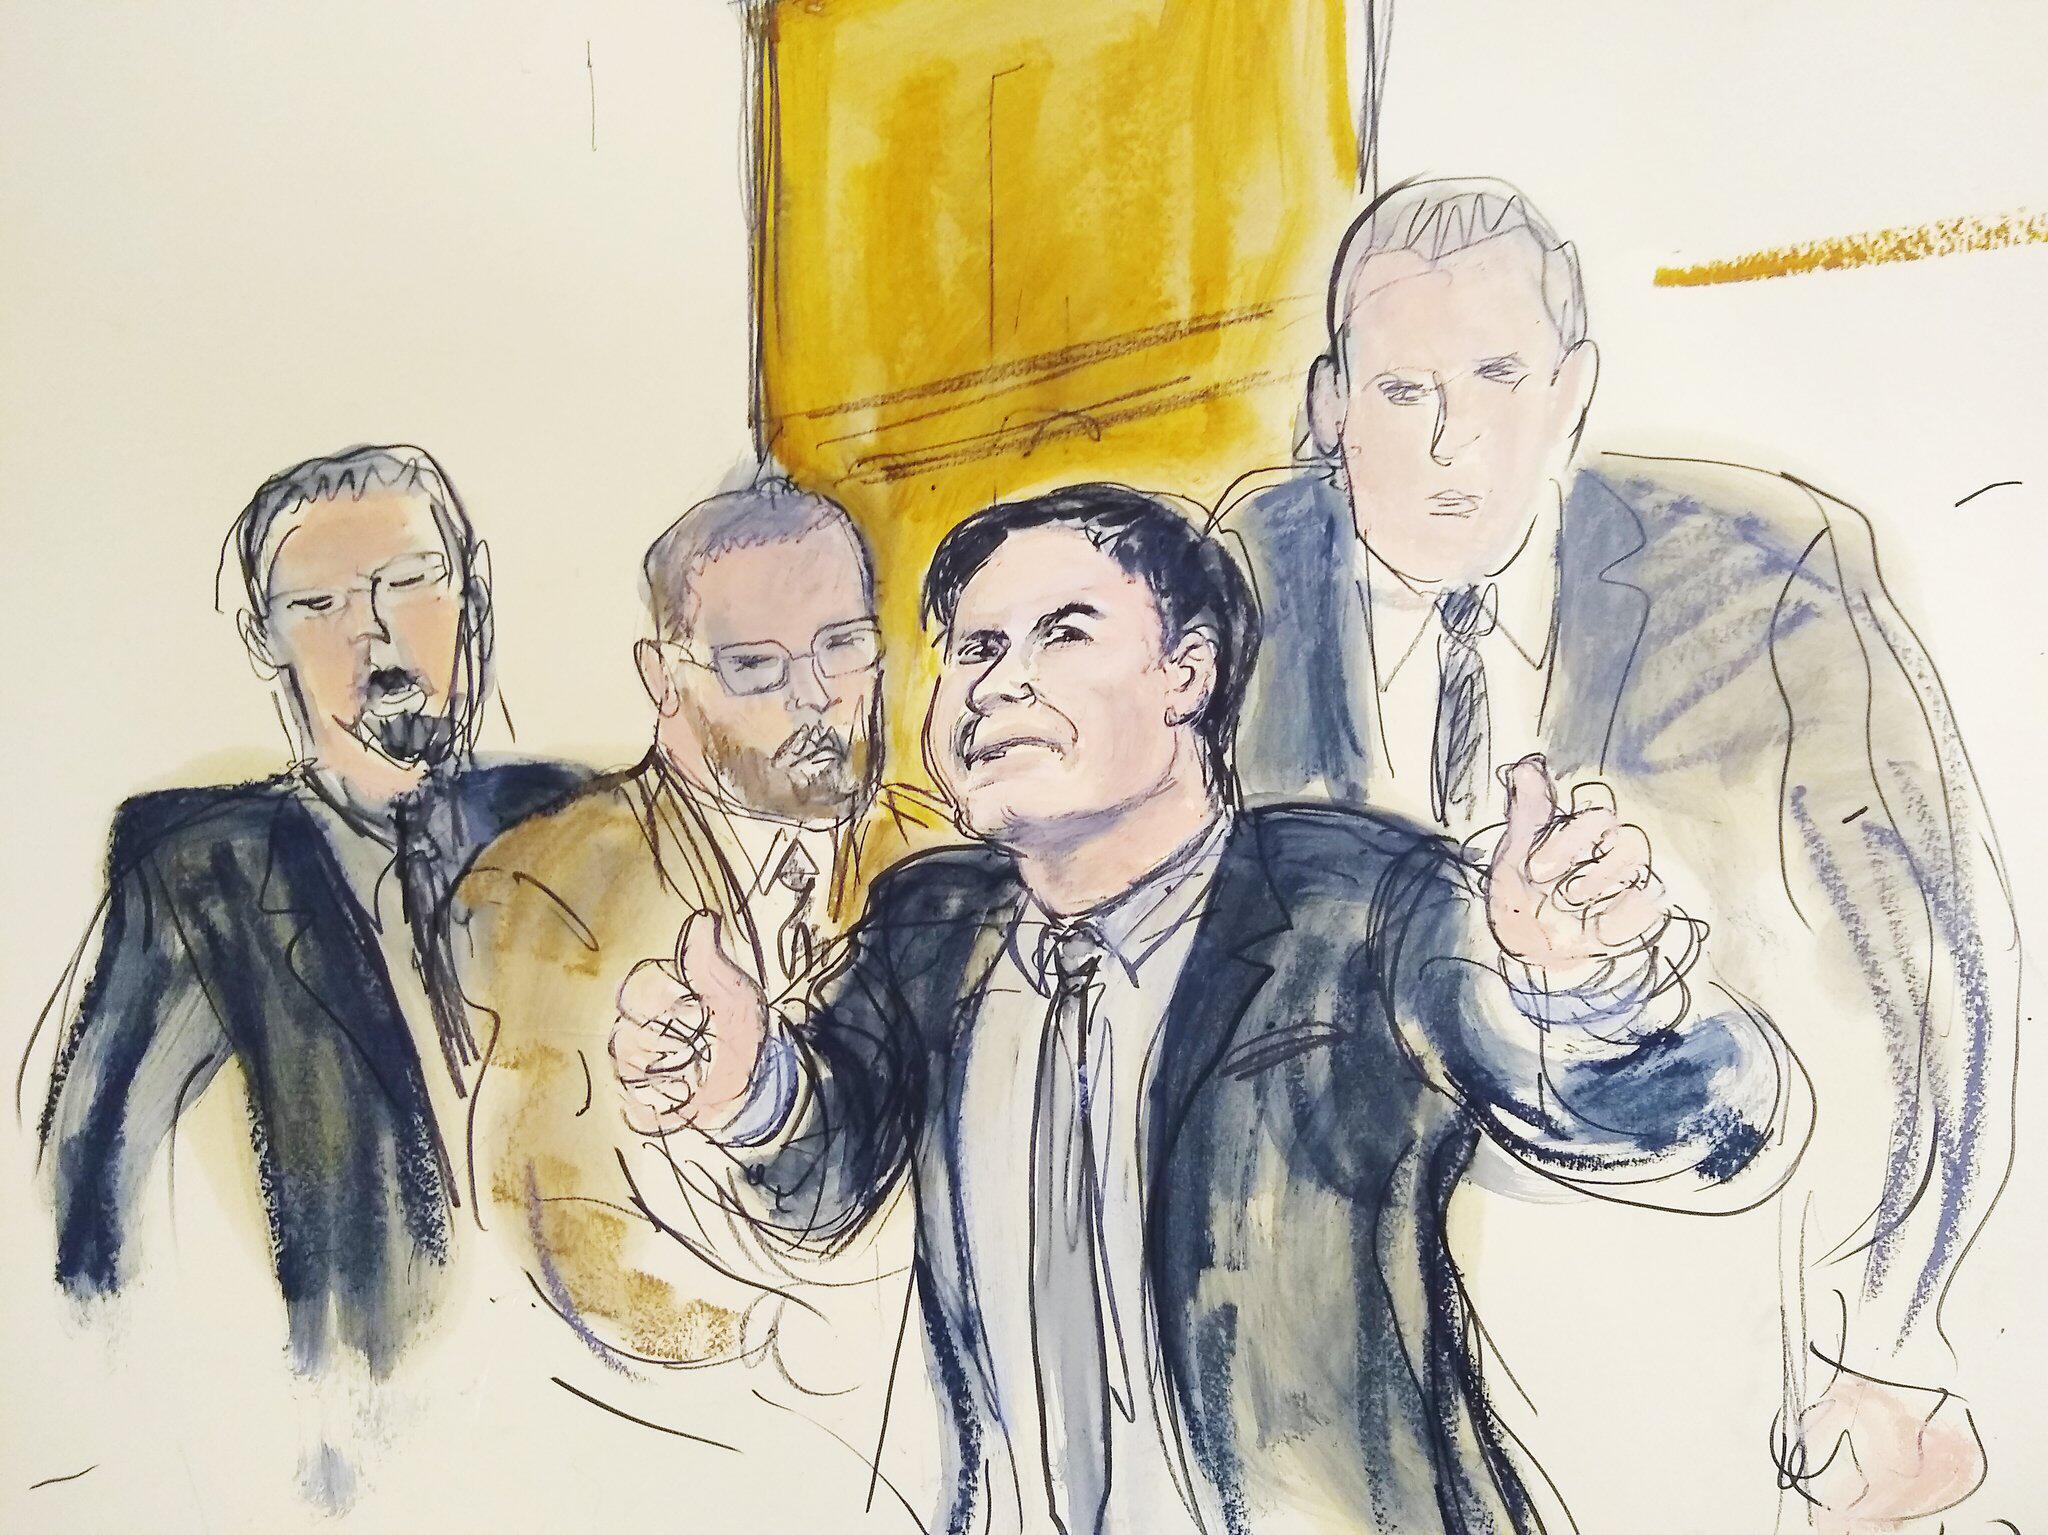 Bild zu Mexikanischer Drogenboss «El Chapo» schuldig gesprochen